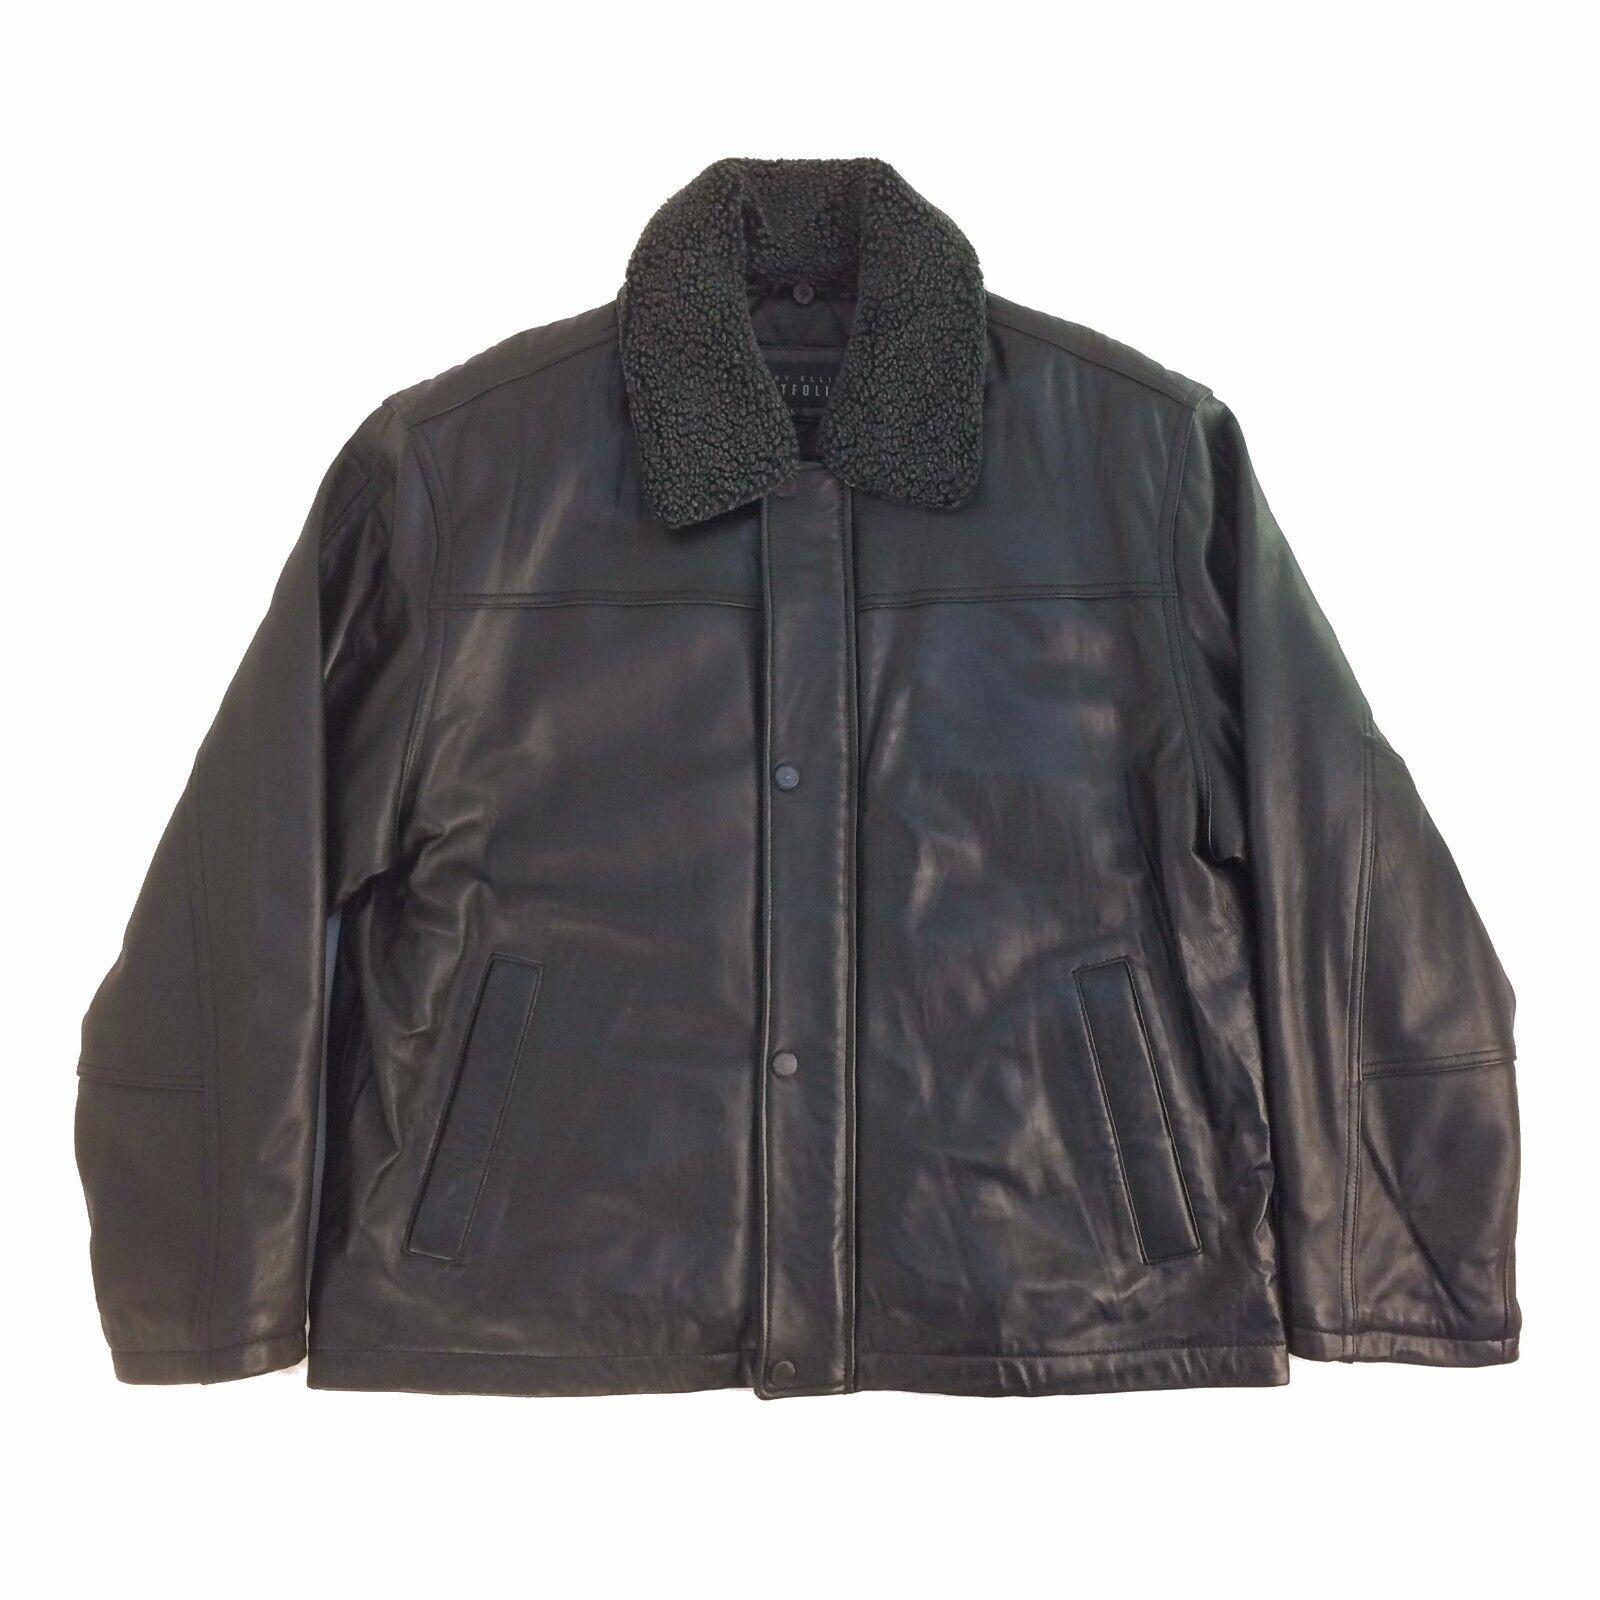 P11925706 Perry Ellis Portfolio, Vintage, Men Zip Up Leder 3/4 Length Coat/JKT